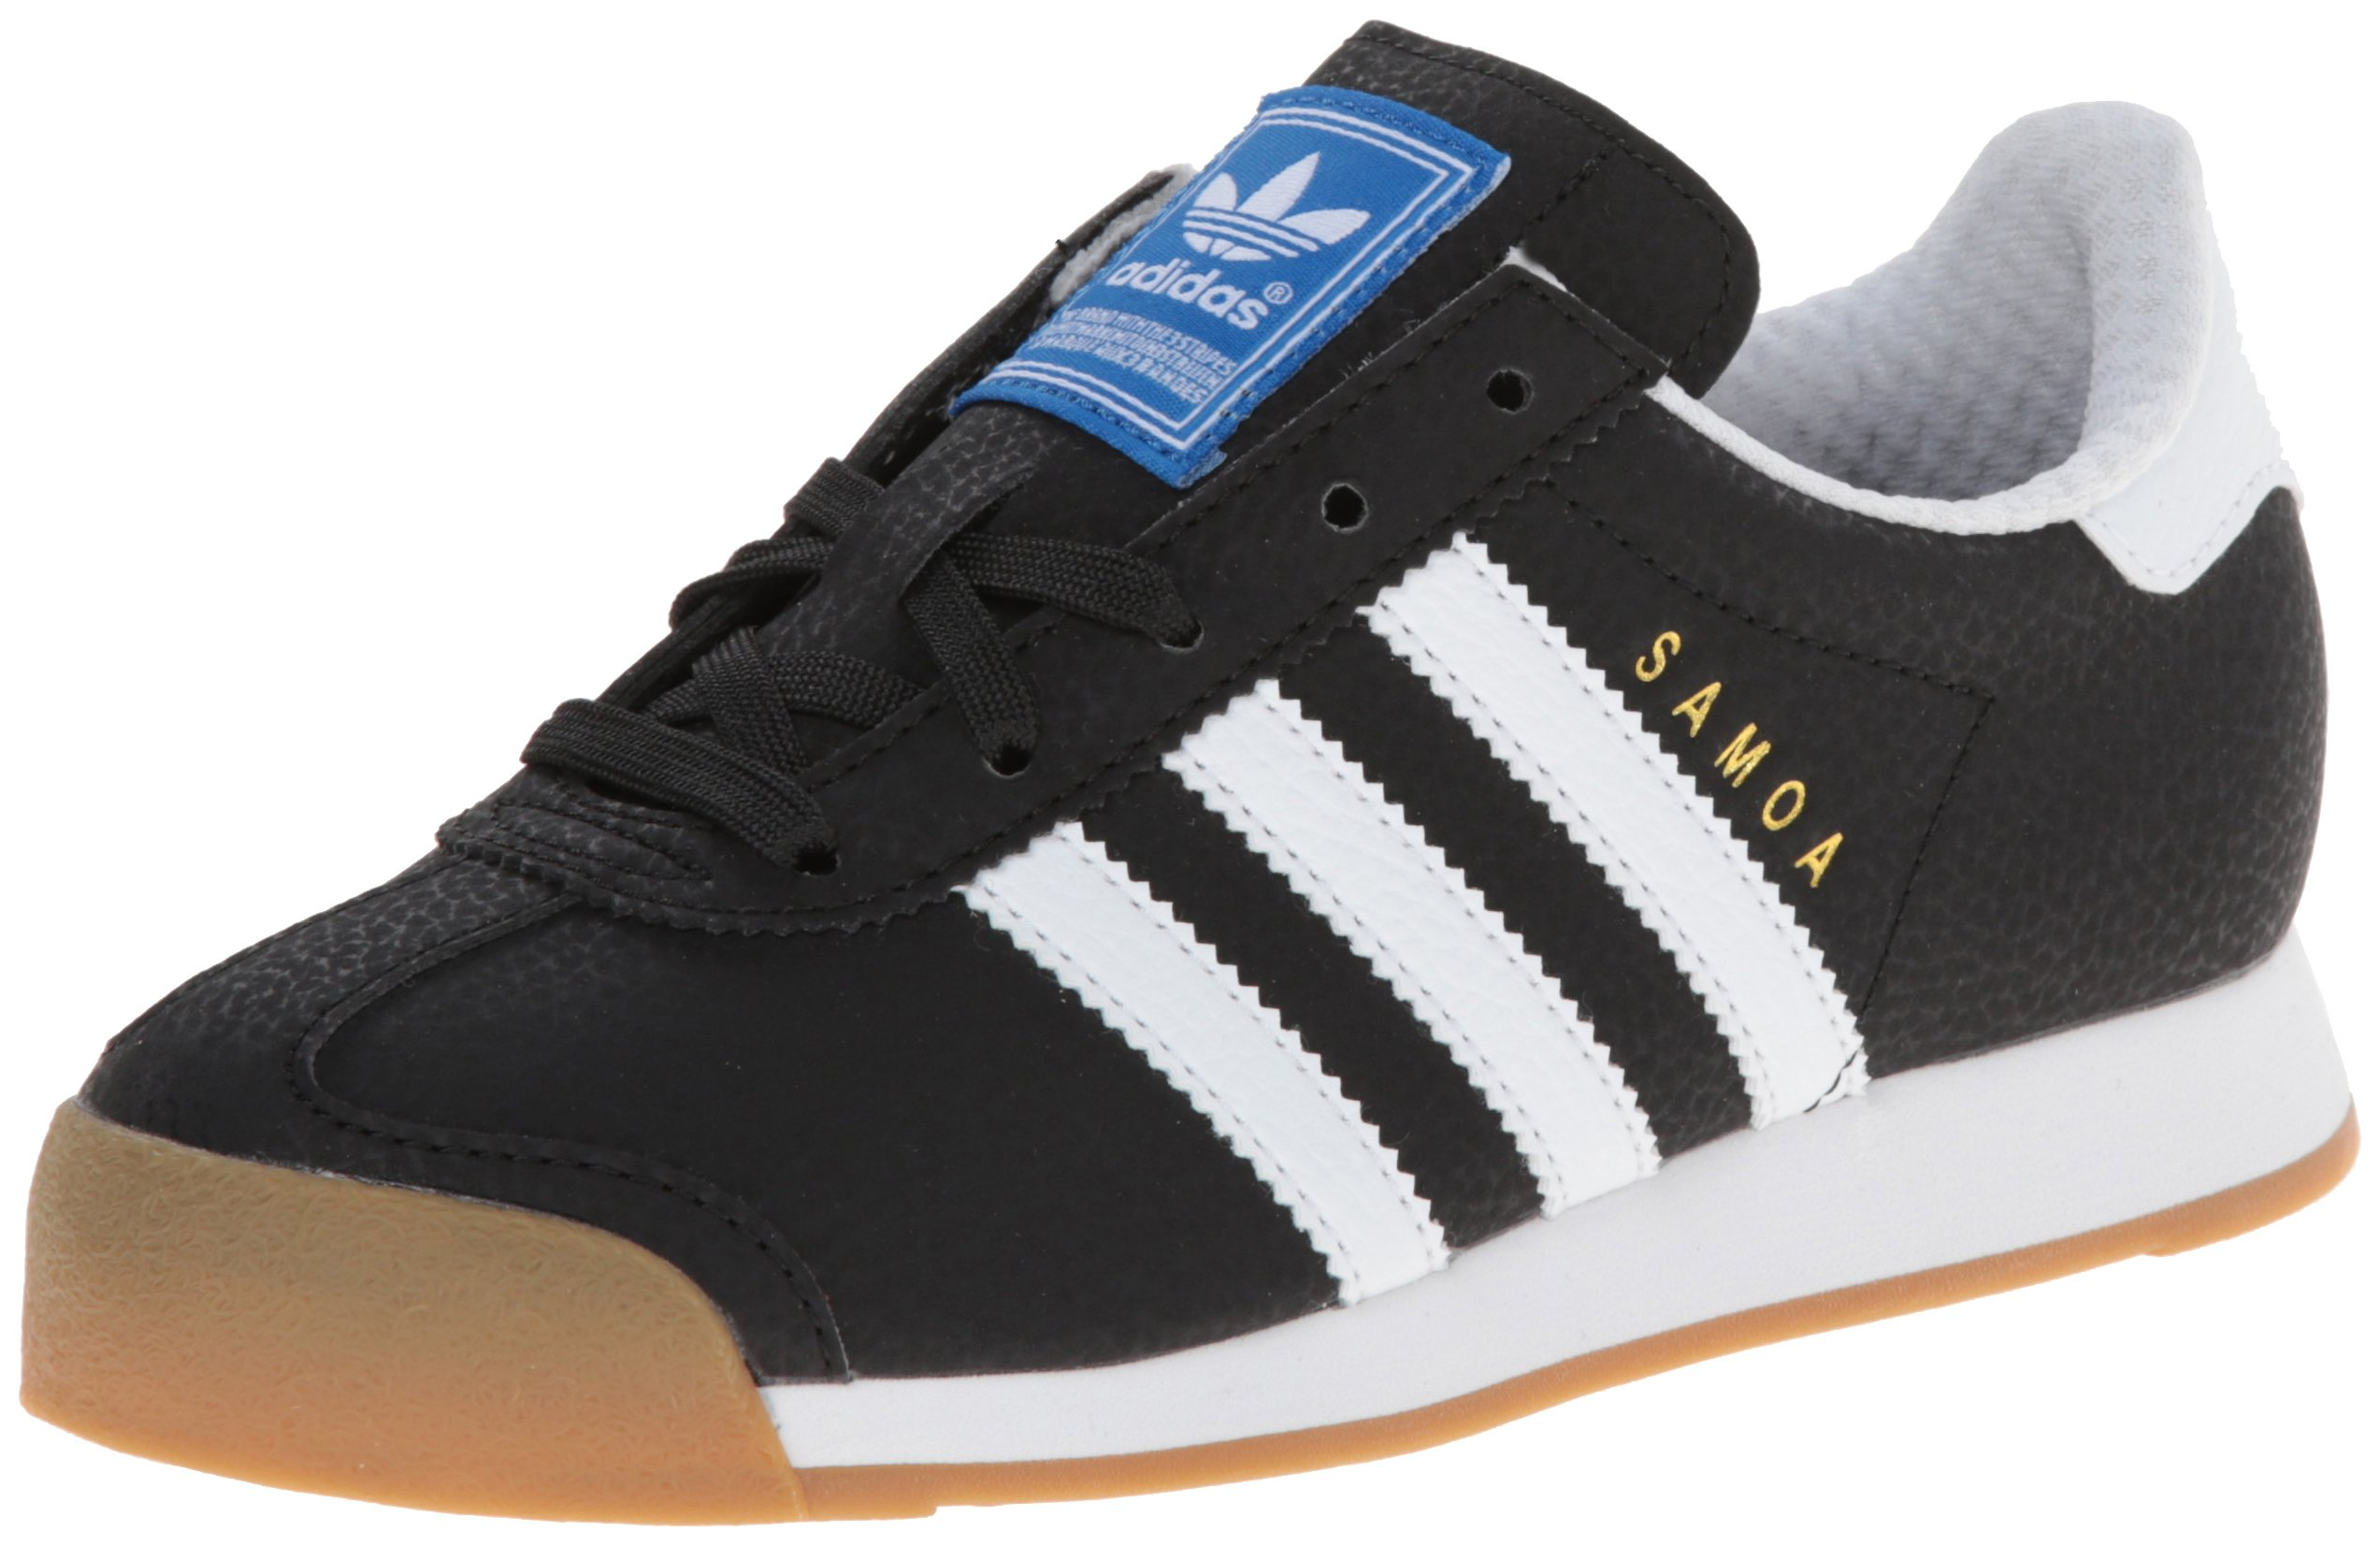 adidas Originals Samoa Sneaker (Little Kid/Big Kid), Black/White/Gold, 2 M US Little Kid